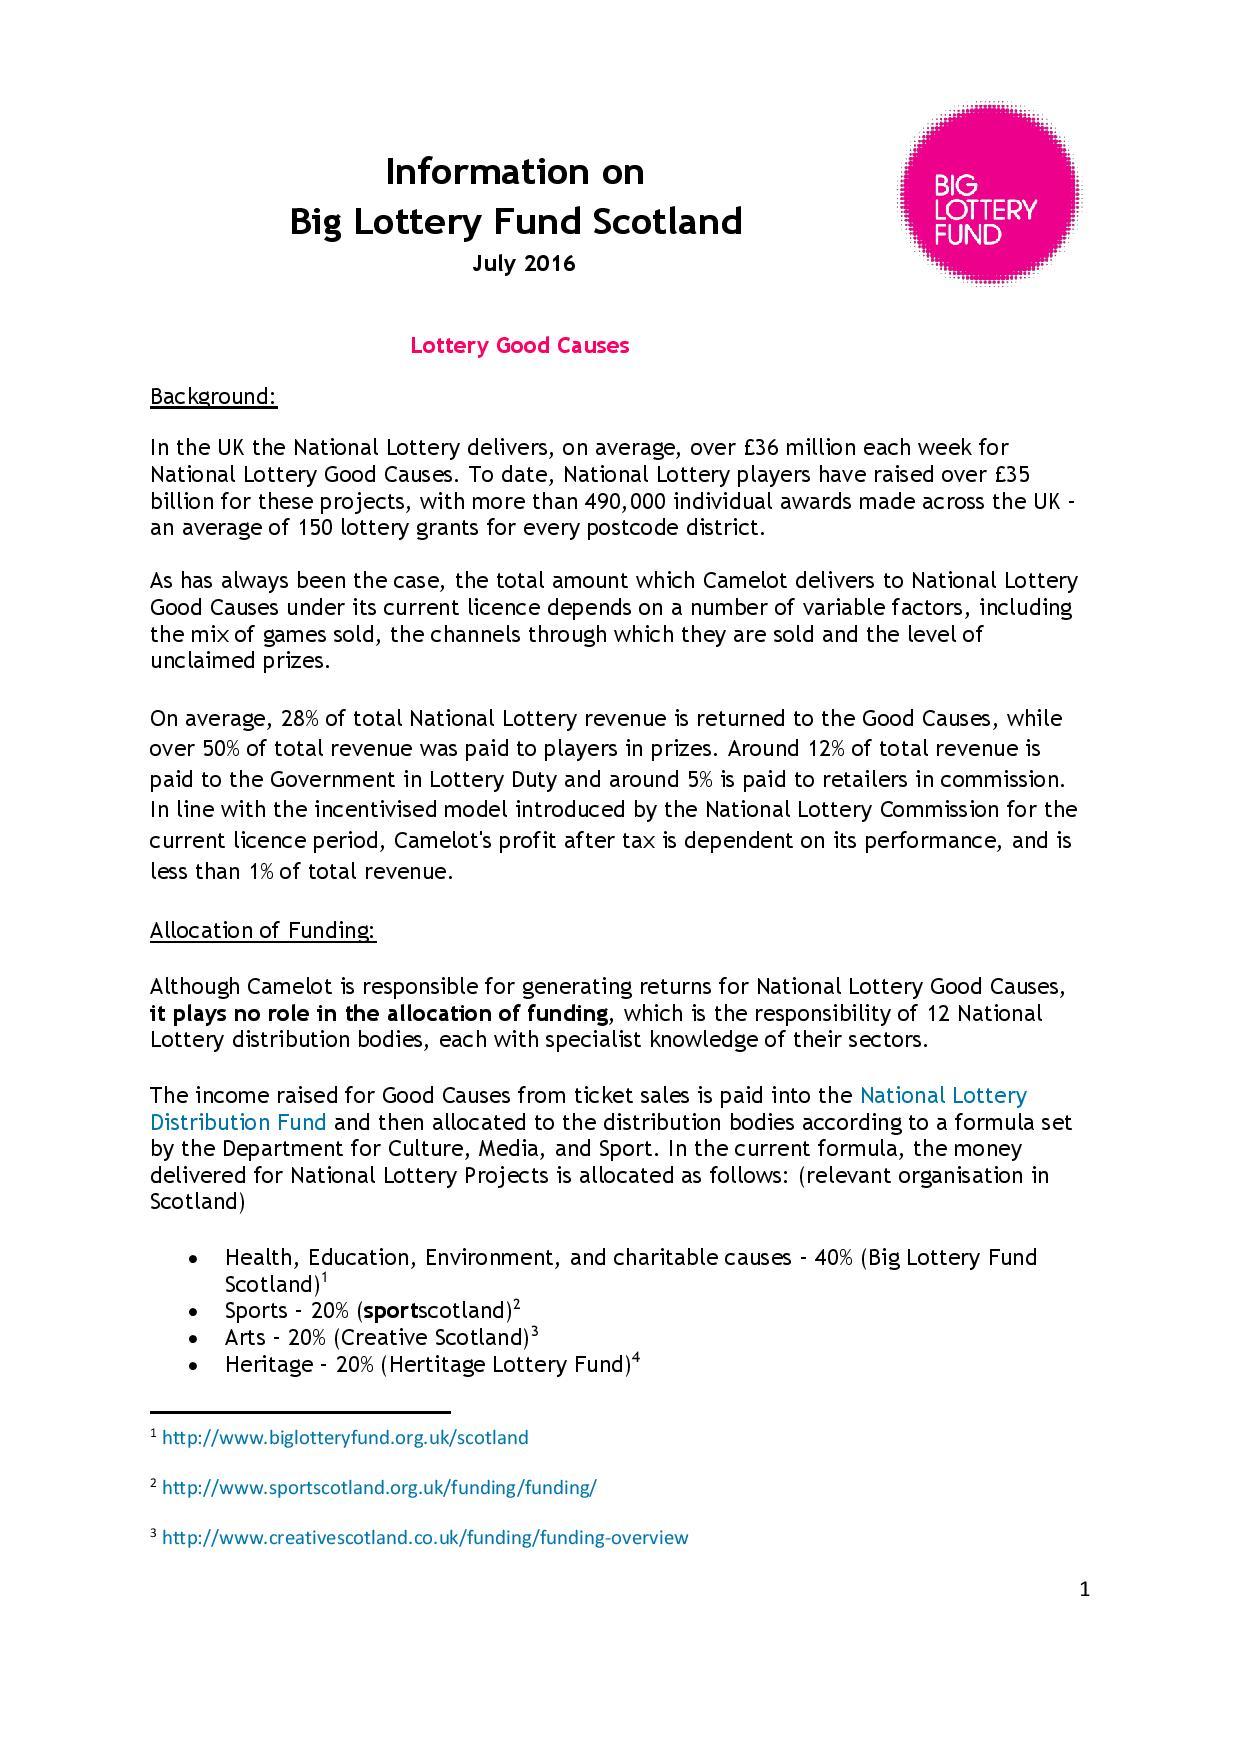 Big_Lottery_Fund_Scotland_Information_Briefing-page-001.jpg